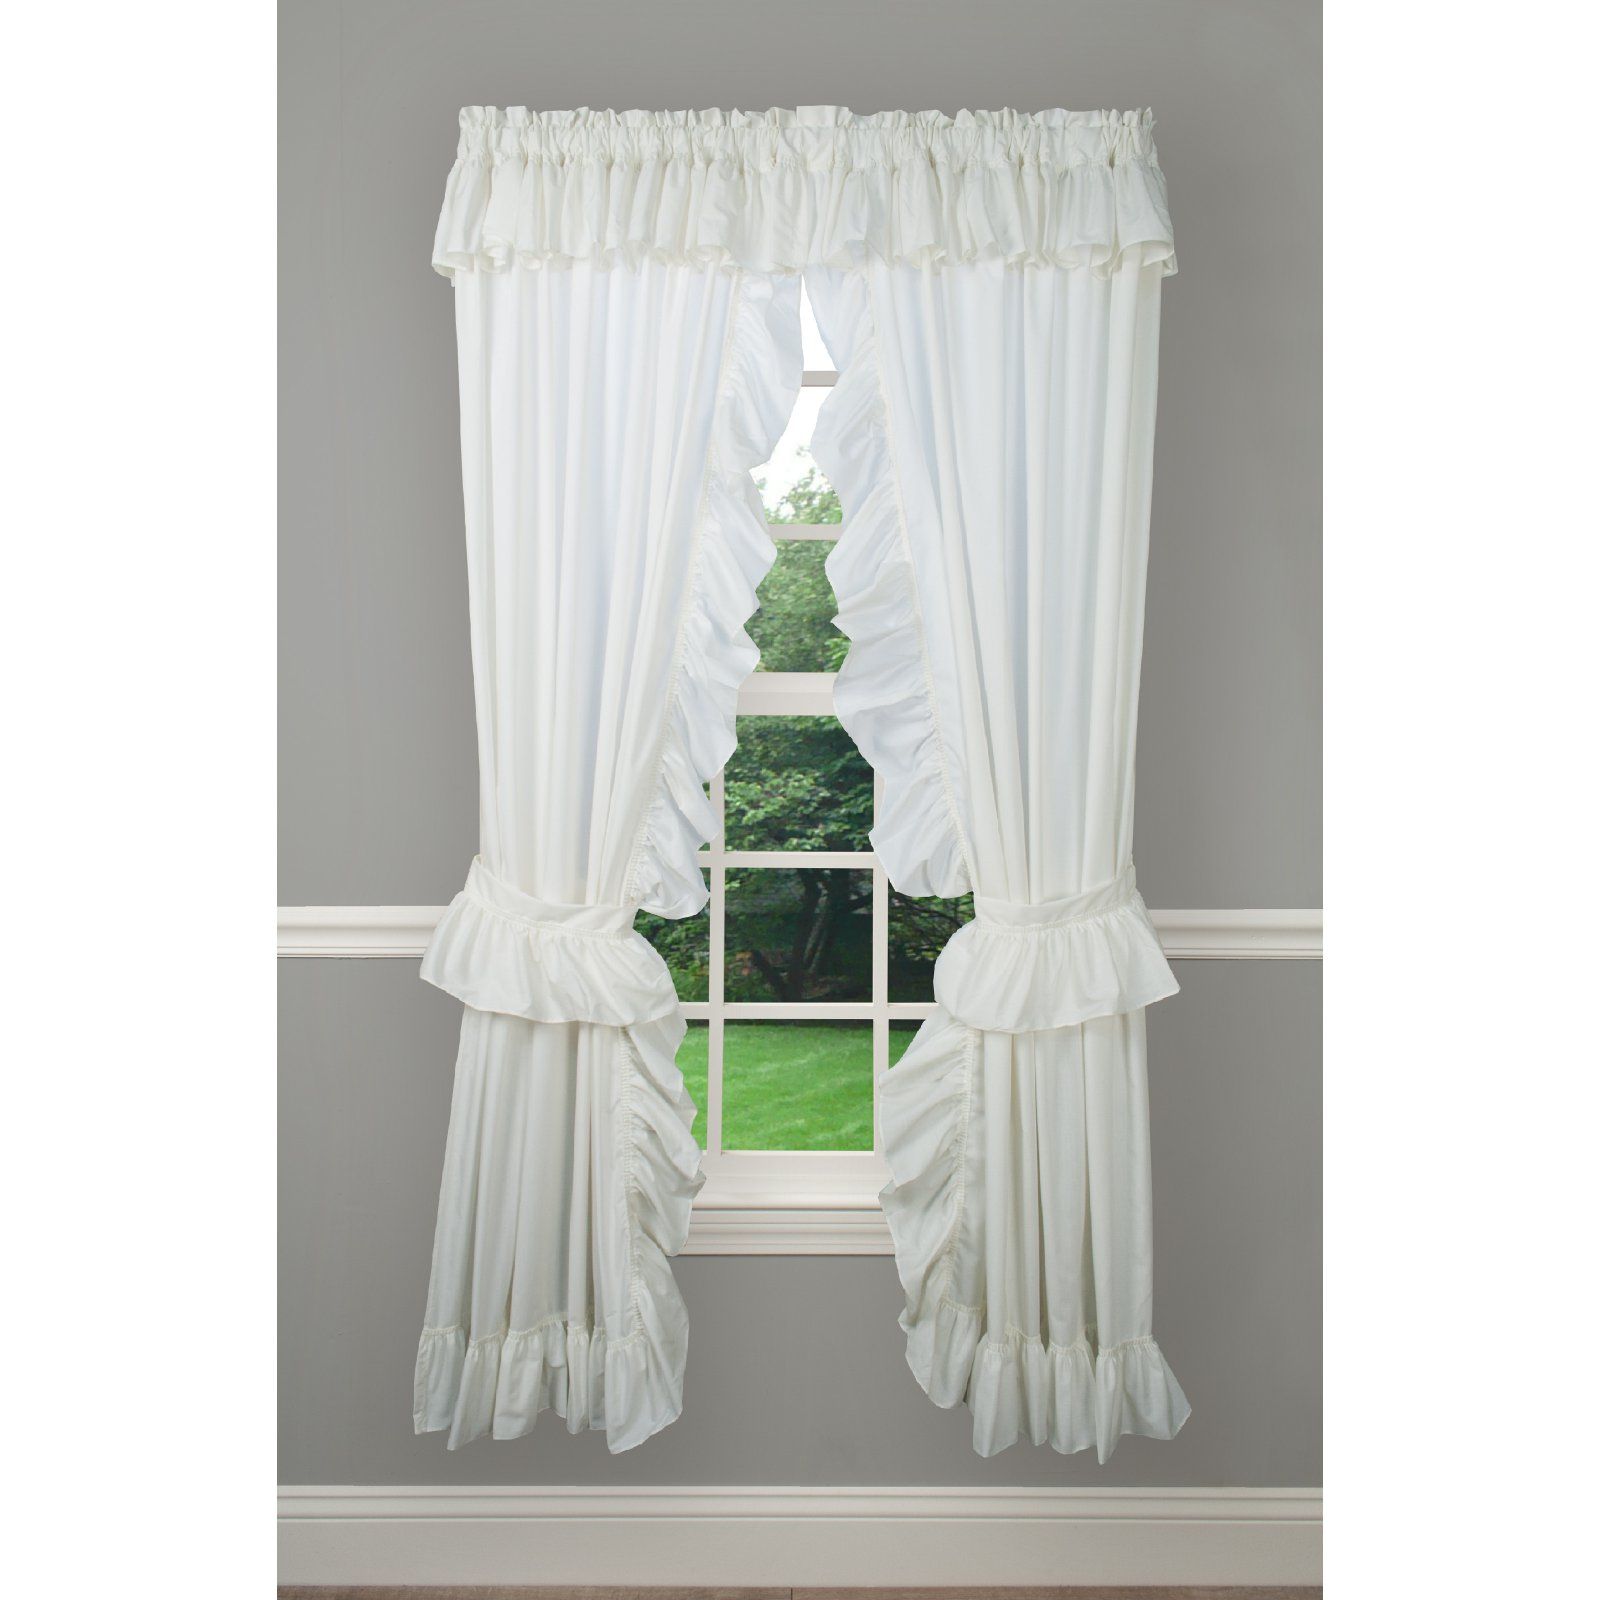 Ellis Curtain Priscillas Wide Ruffle Rod Pocket Curtain Panel Pair